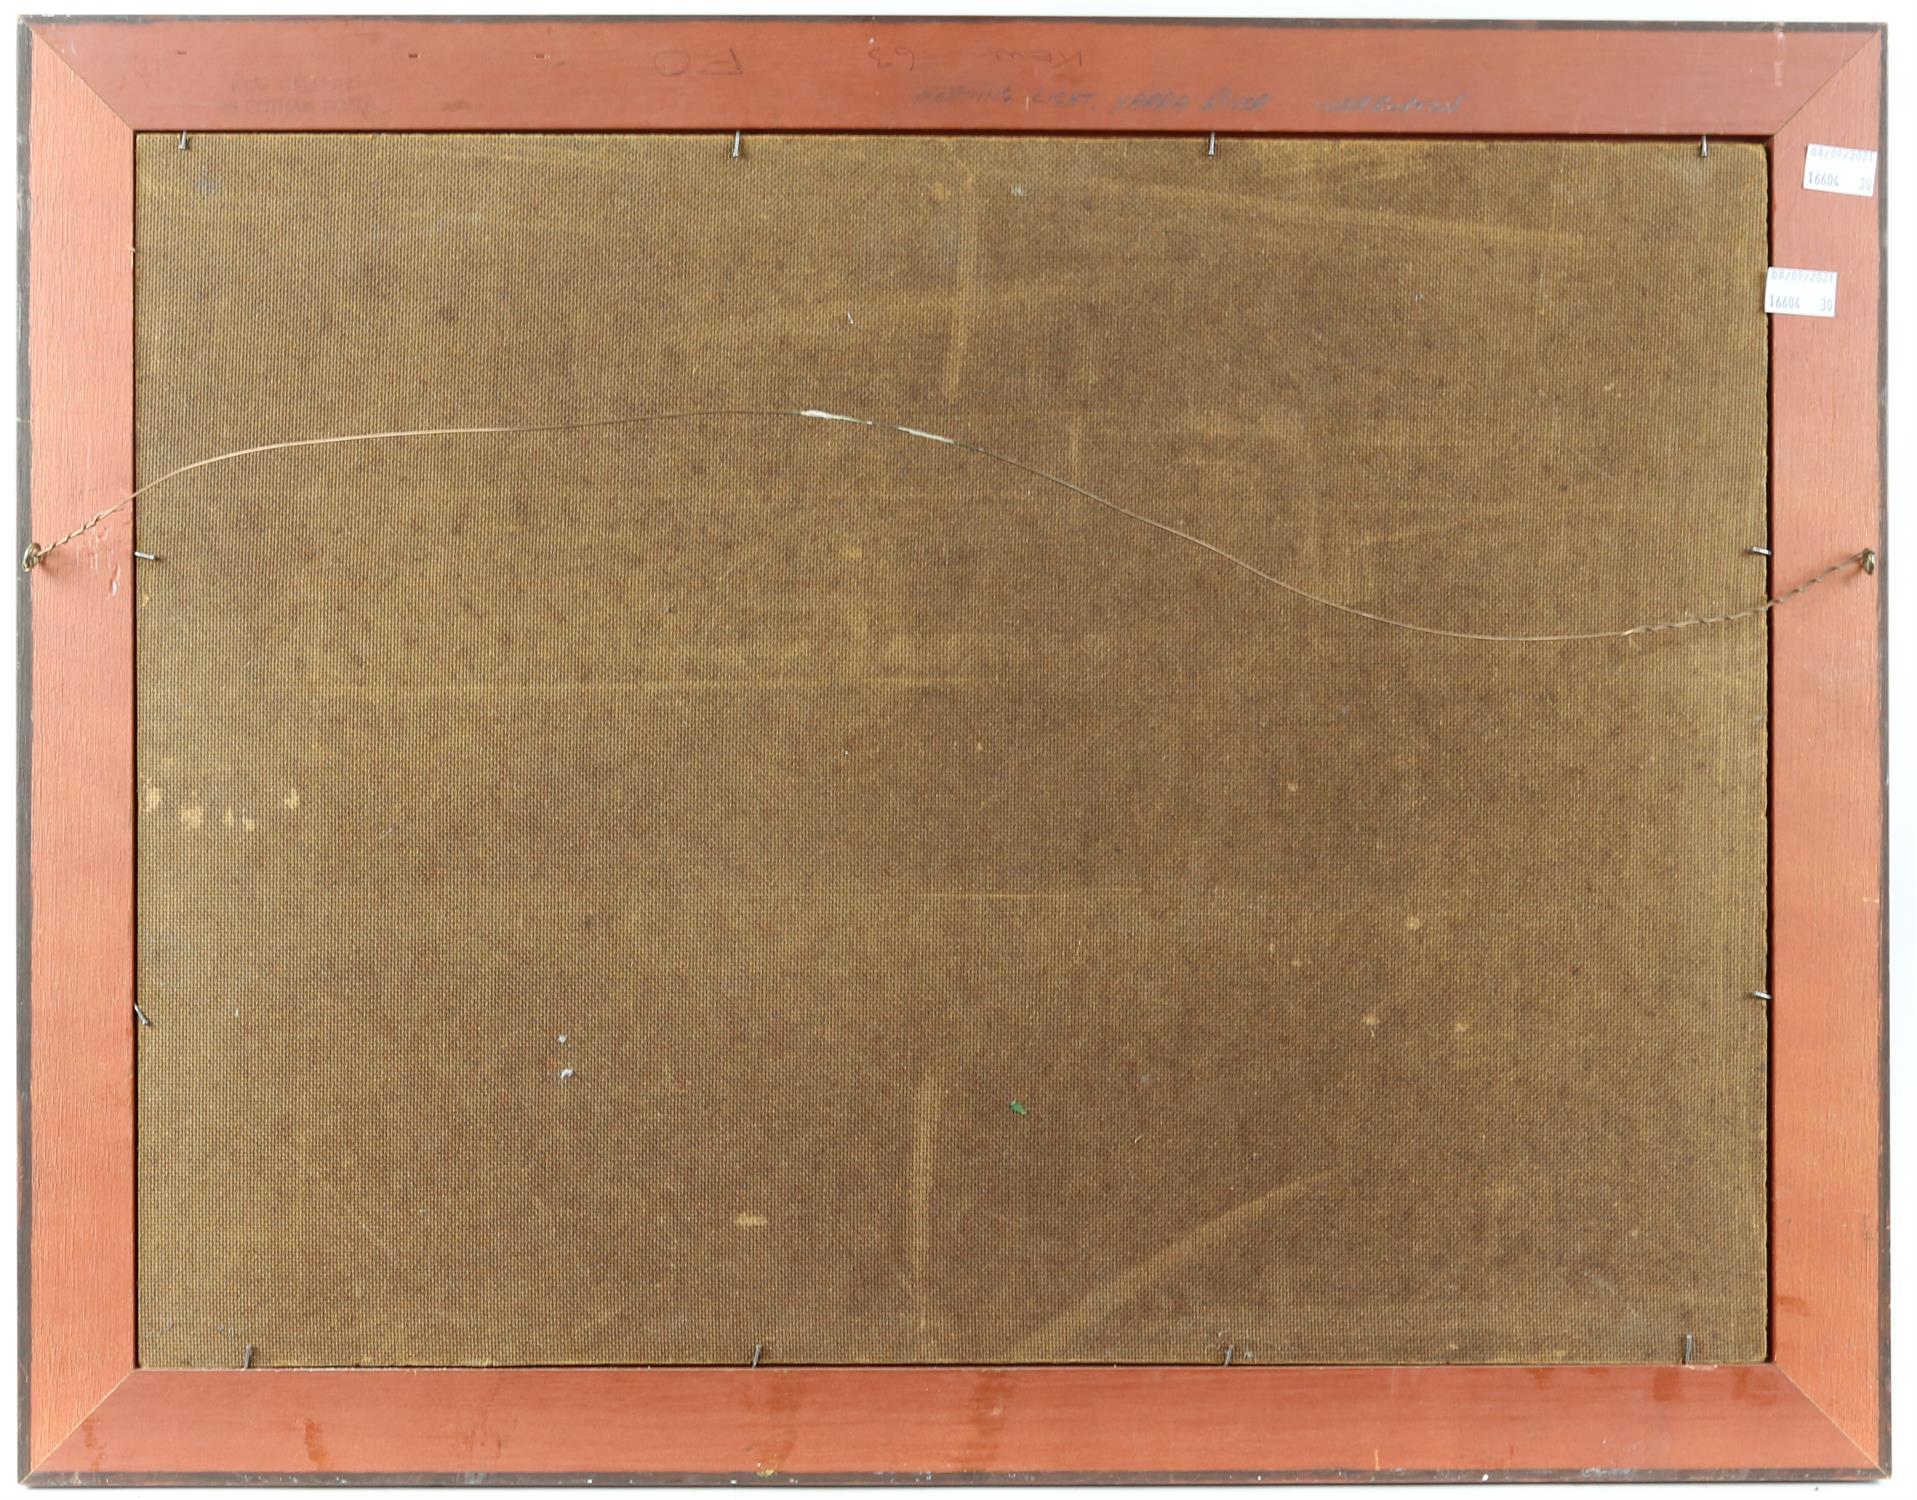 Gerard Mutsaers (Australian b. 1947), 'Morning Light, Yarra River, Warburton', signed, oil on board, - Image 3 of 4